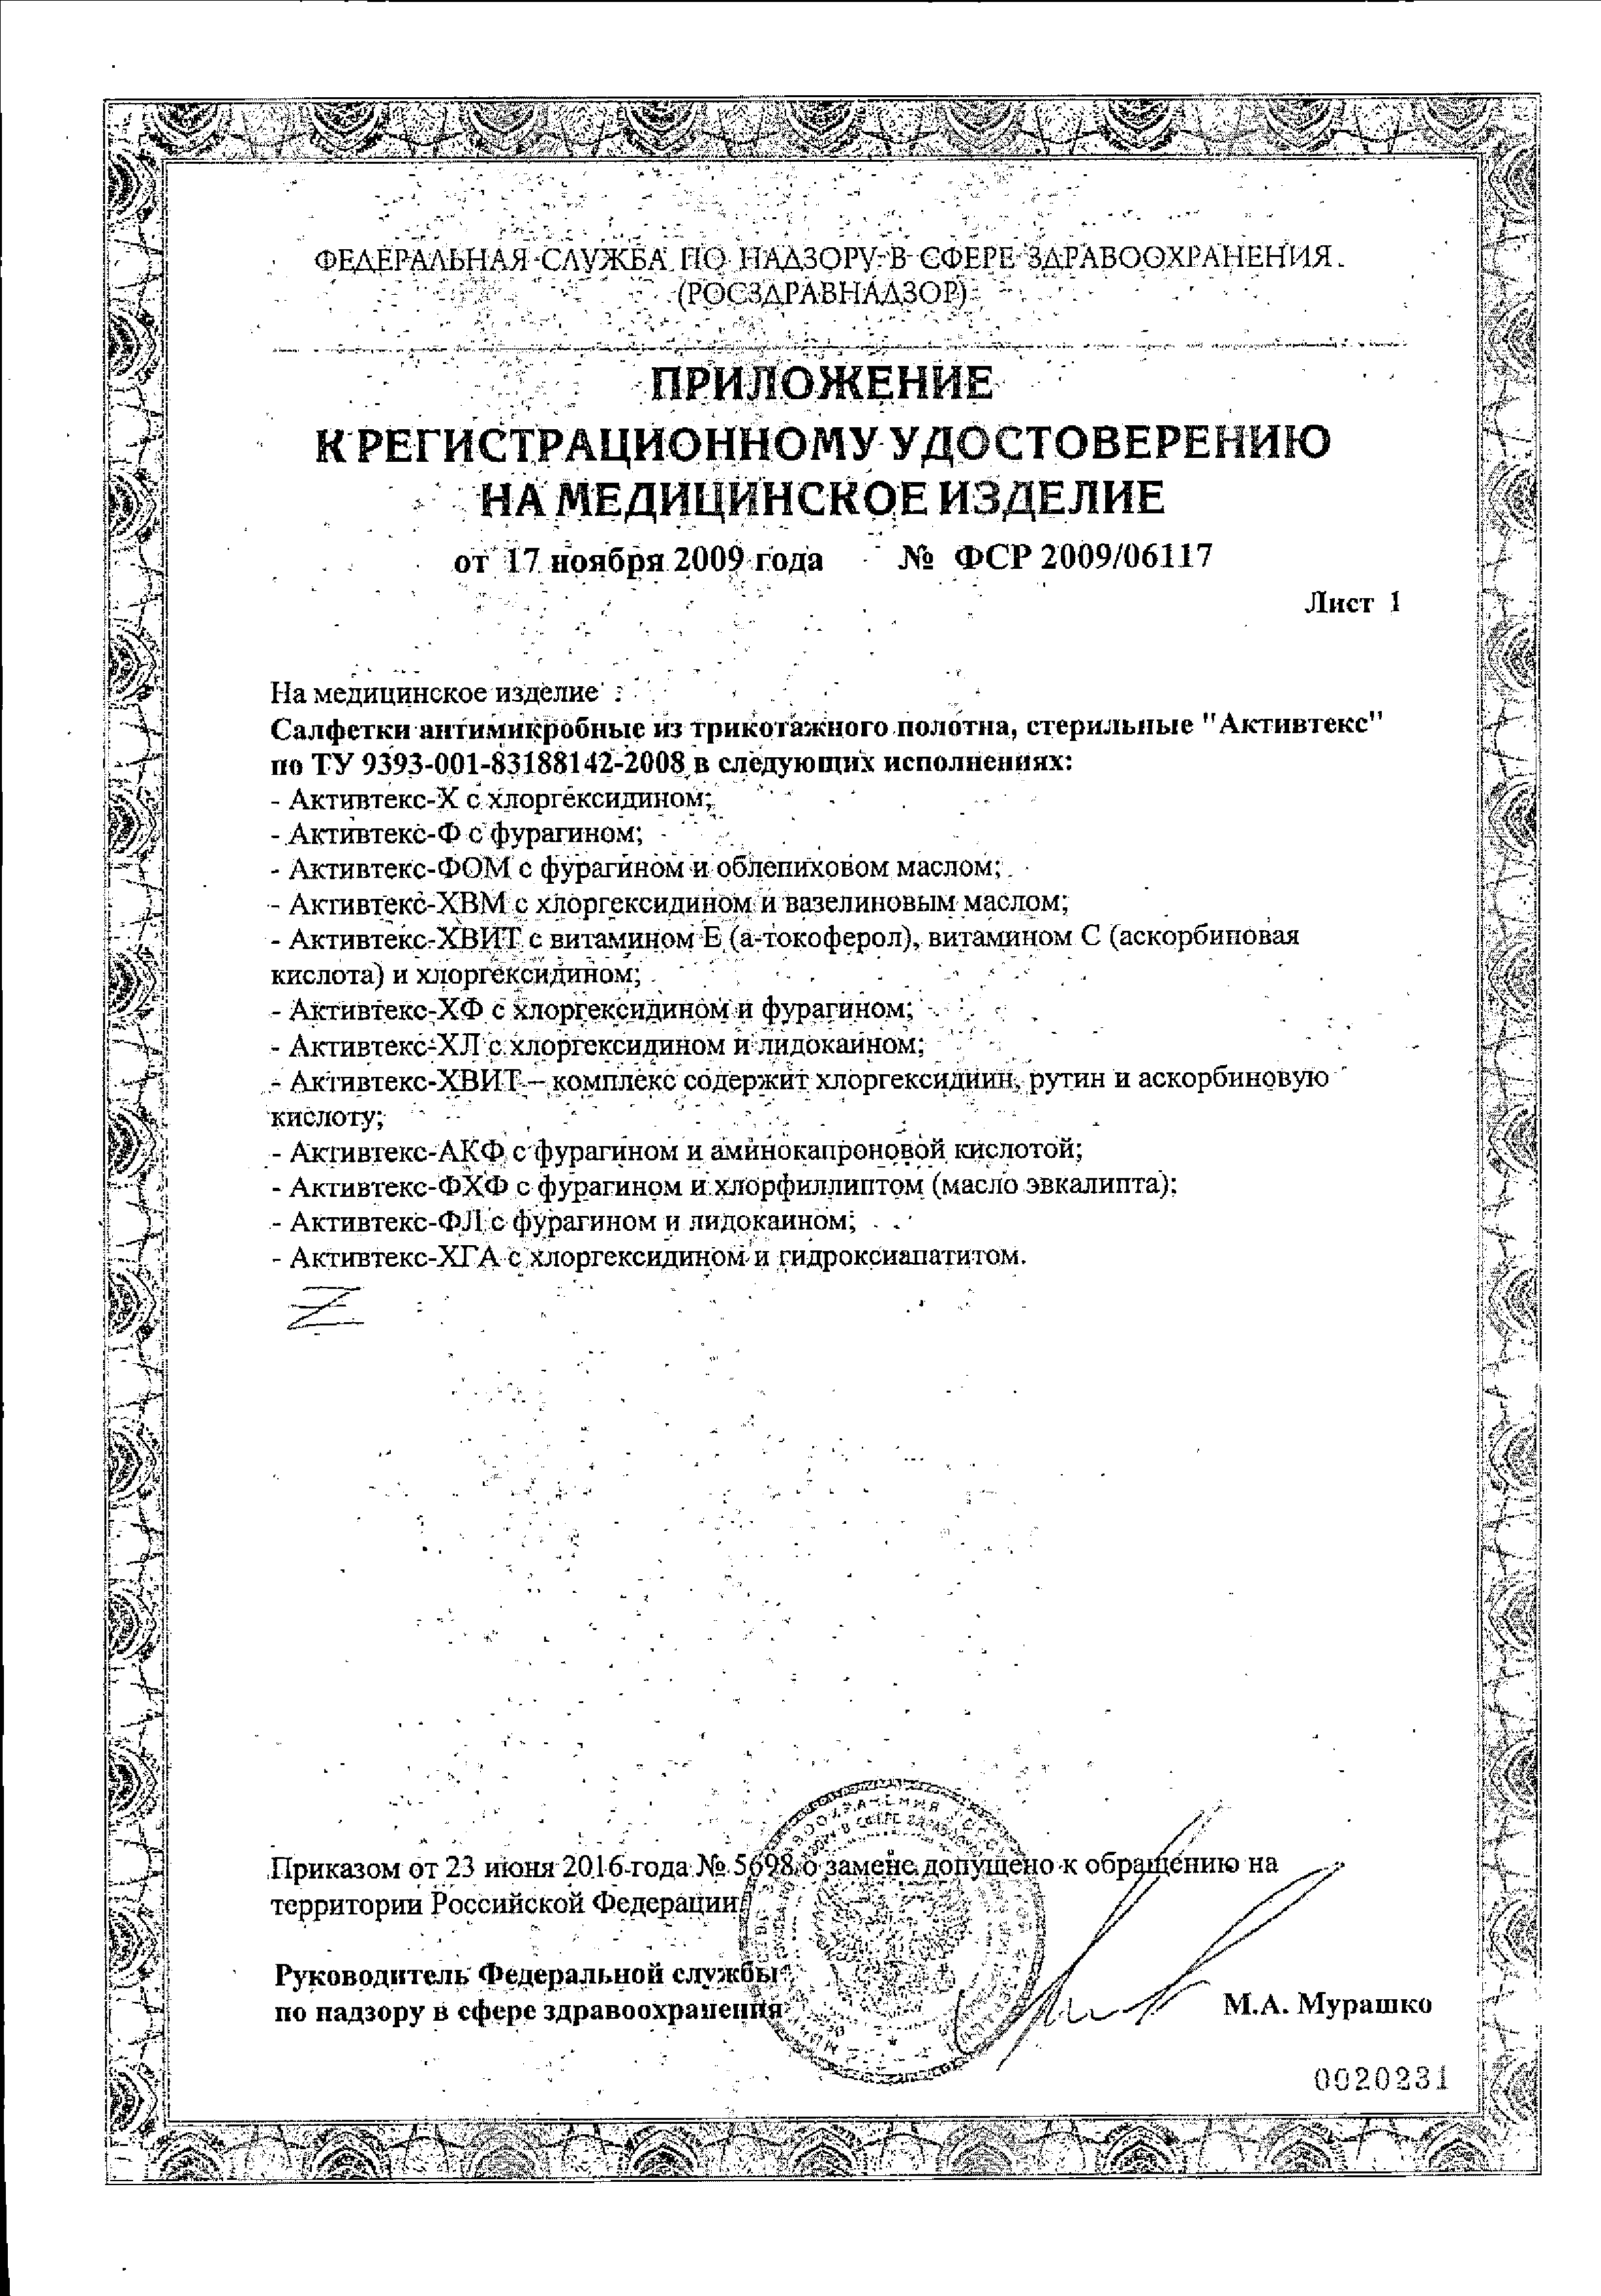 Активтекс-ФОМ салфетка заживляющая сертификат